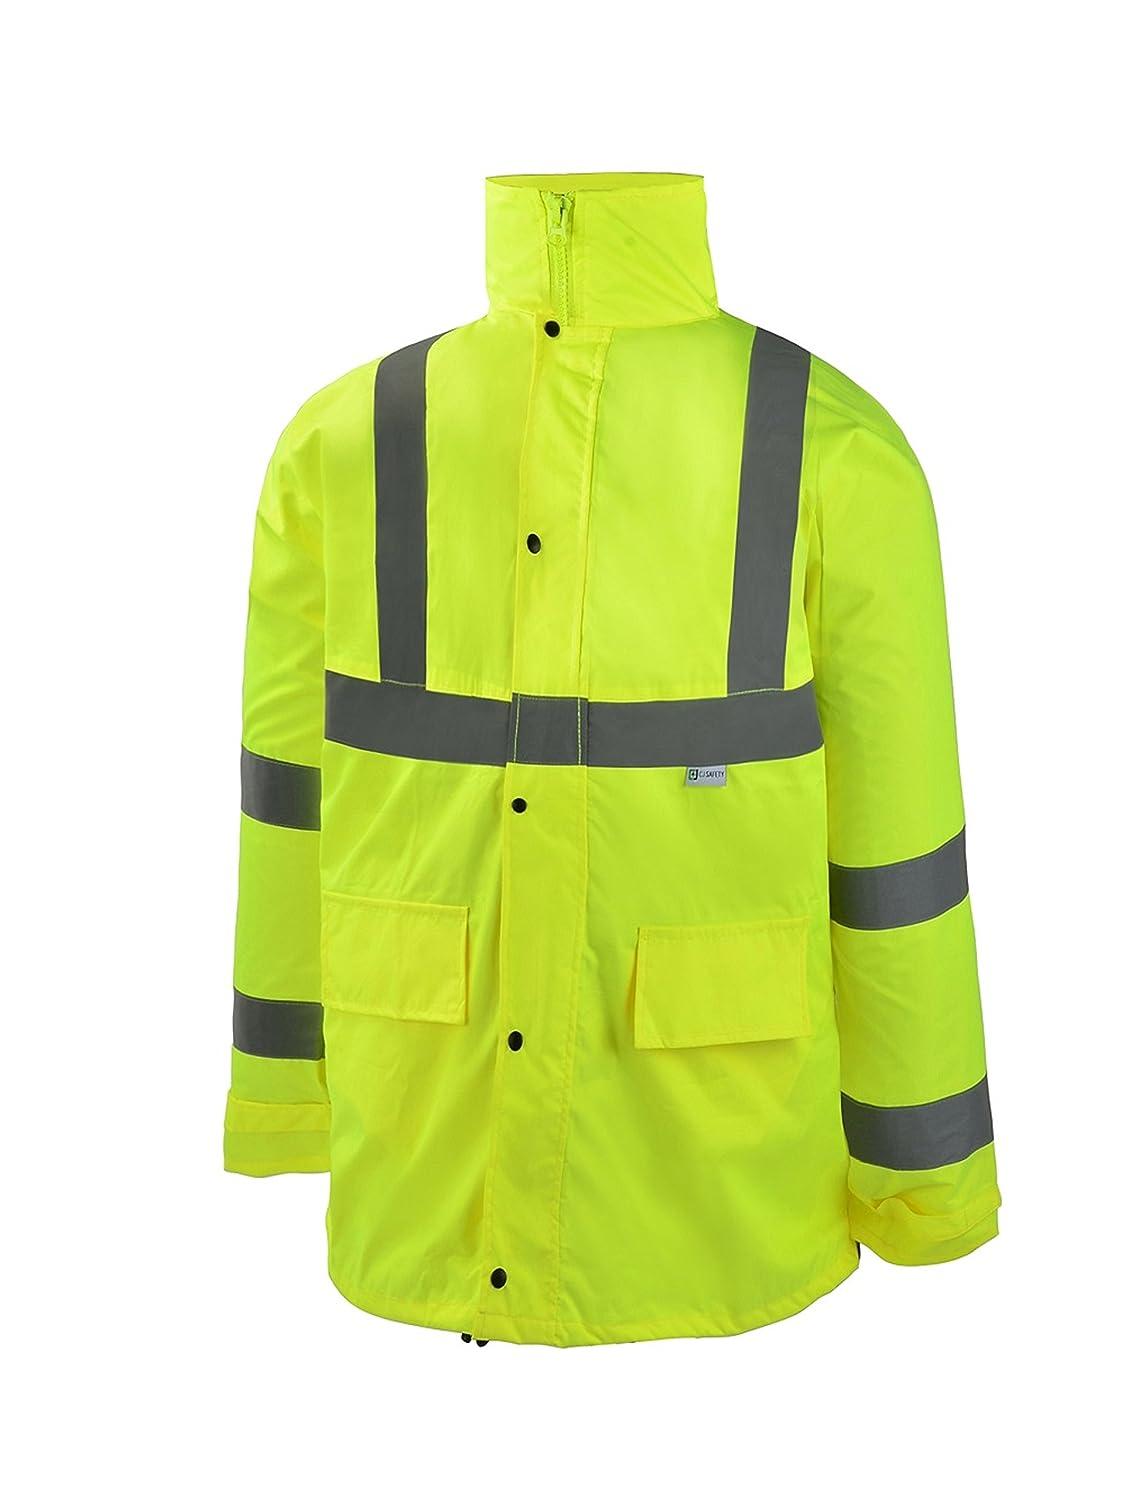 CJ Safety CJHVRJ3001 Hi Viz Safety Rain Suit Set (Jacket & Pants) (2XL/3XL)